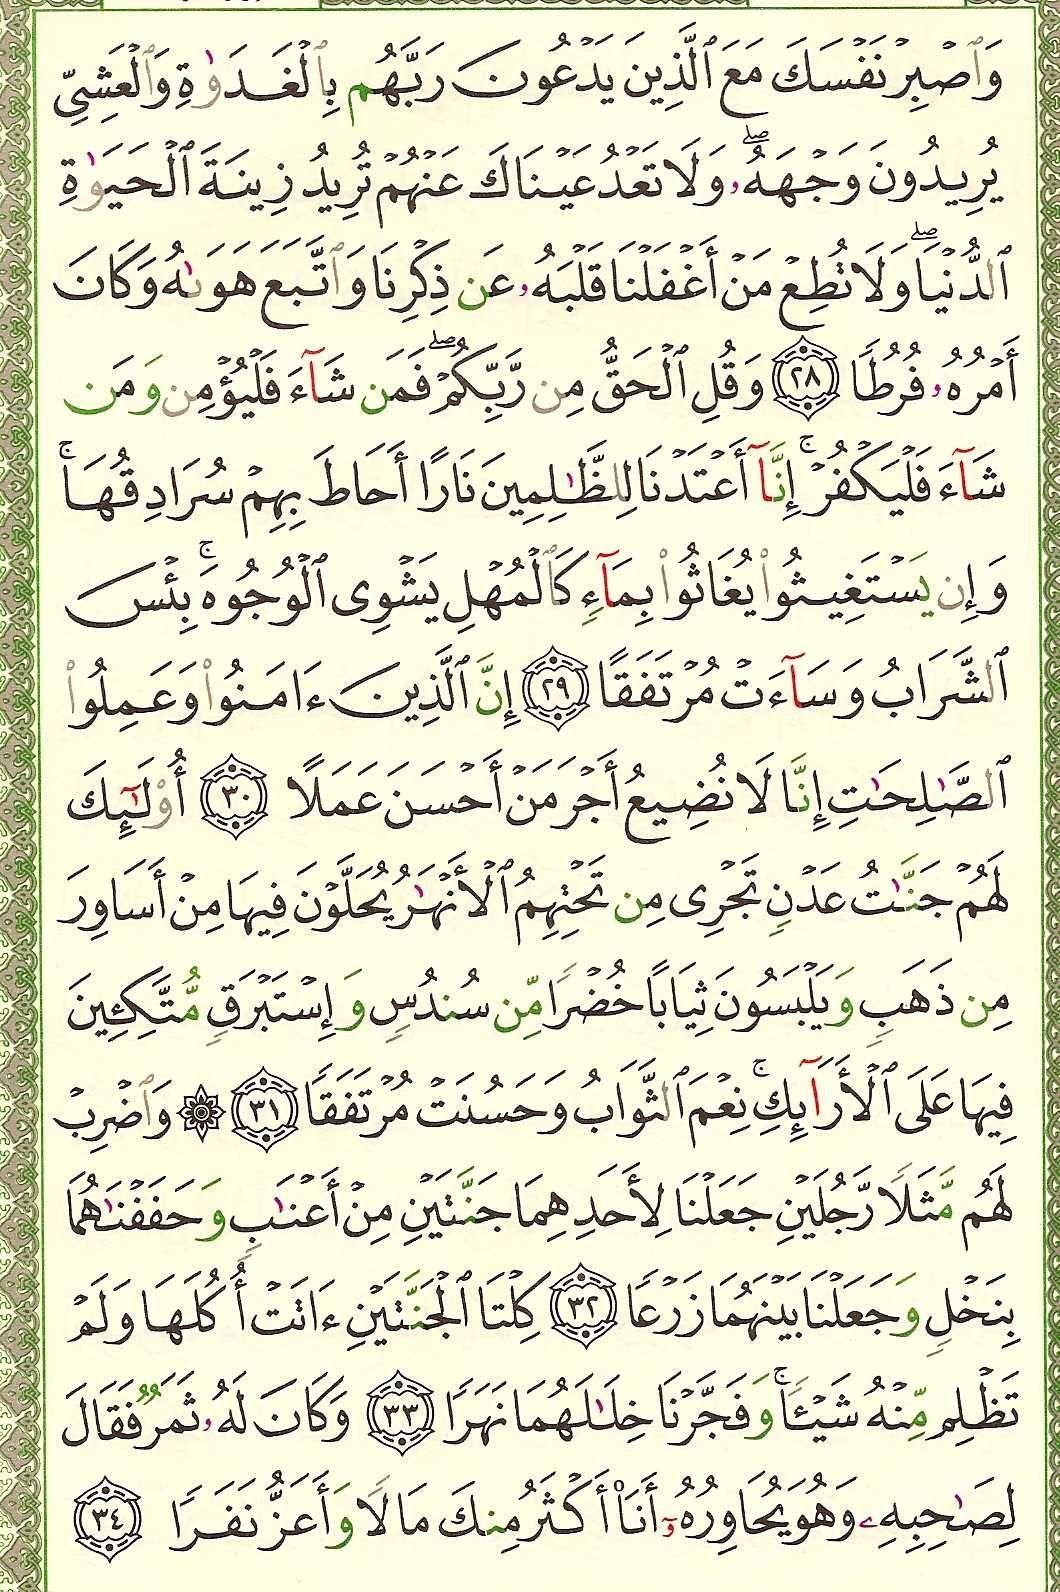 Quran 18 Al Kahf سورة الكهف Style 1 Page 297 القرآن الكريم Math Quran Reading